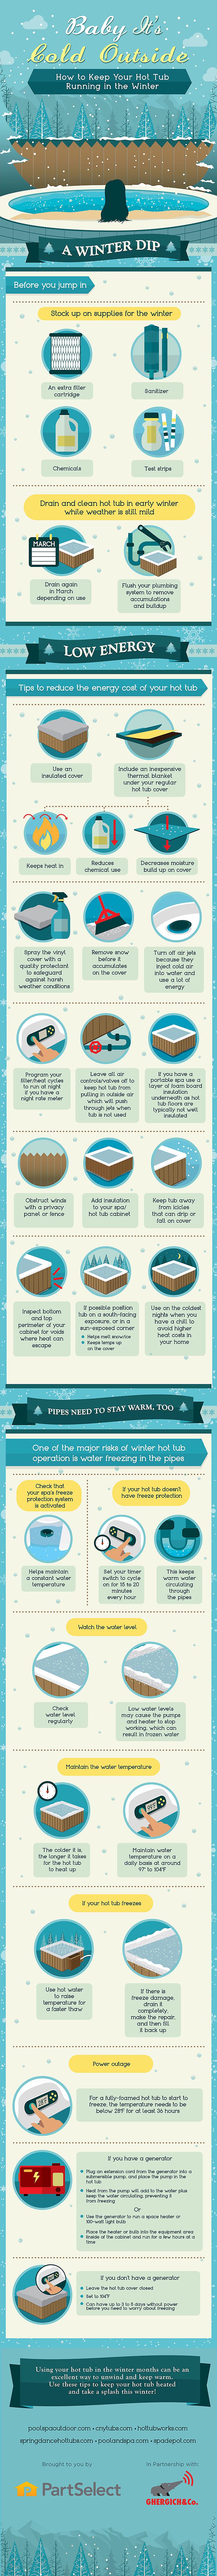 Hot tub maintenance infographic